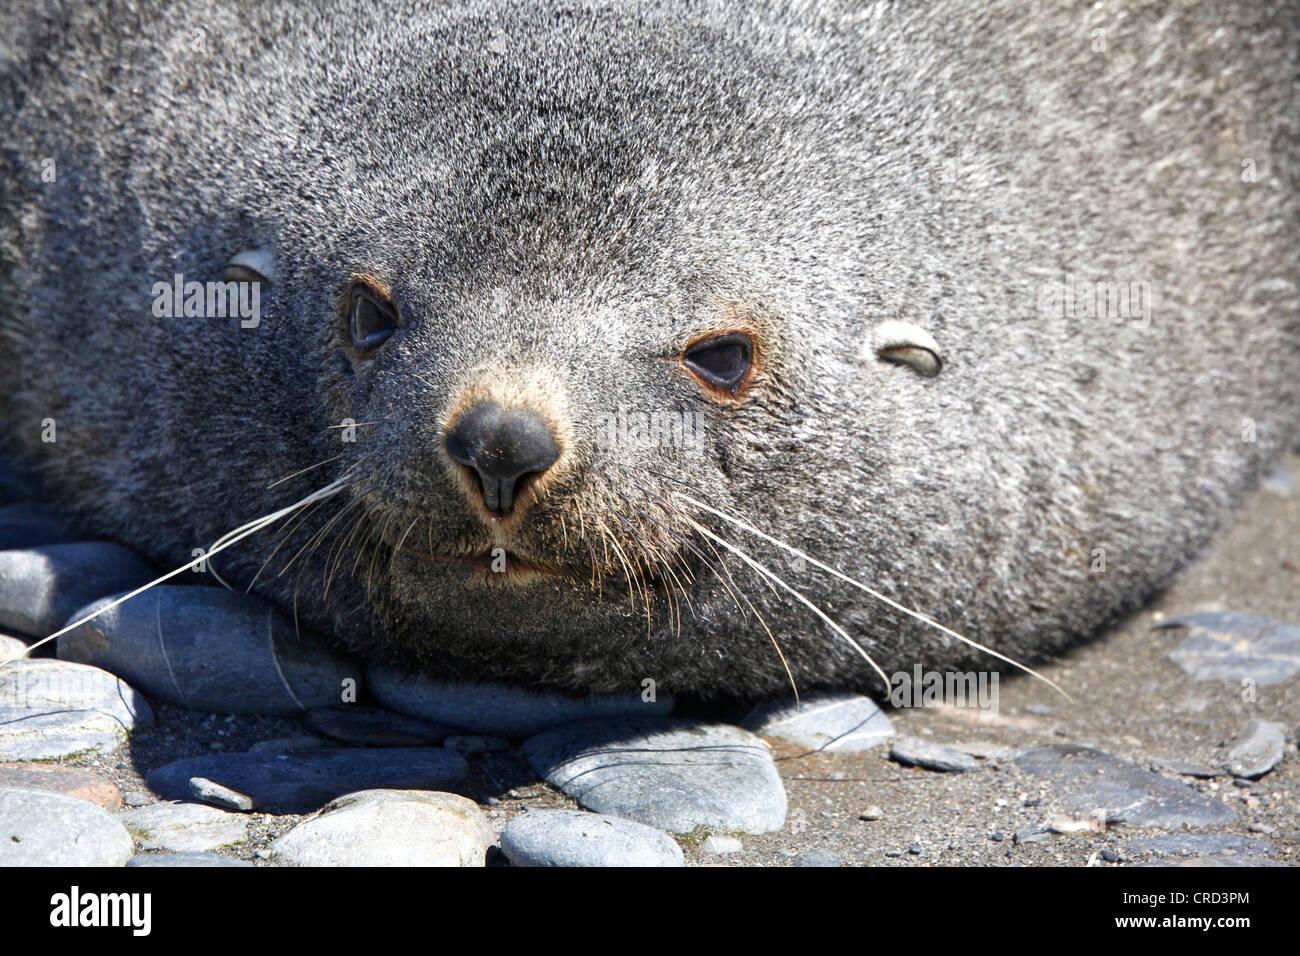 Seal, portrait, South Georgia - Stock Image